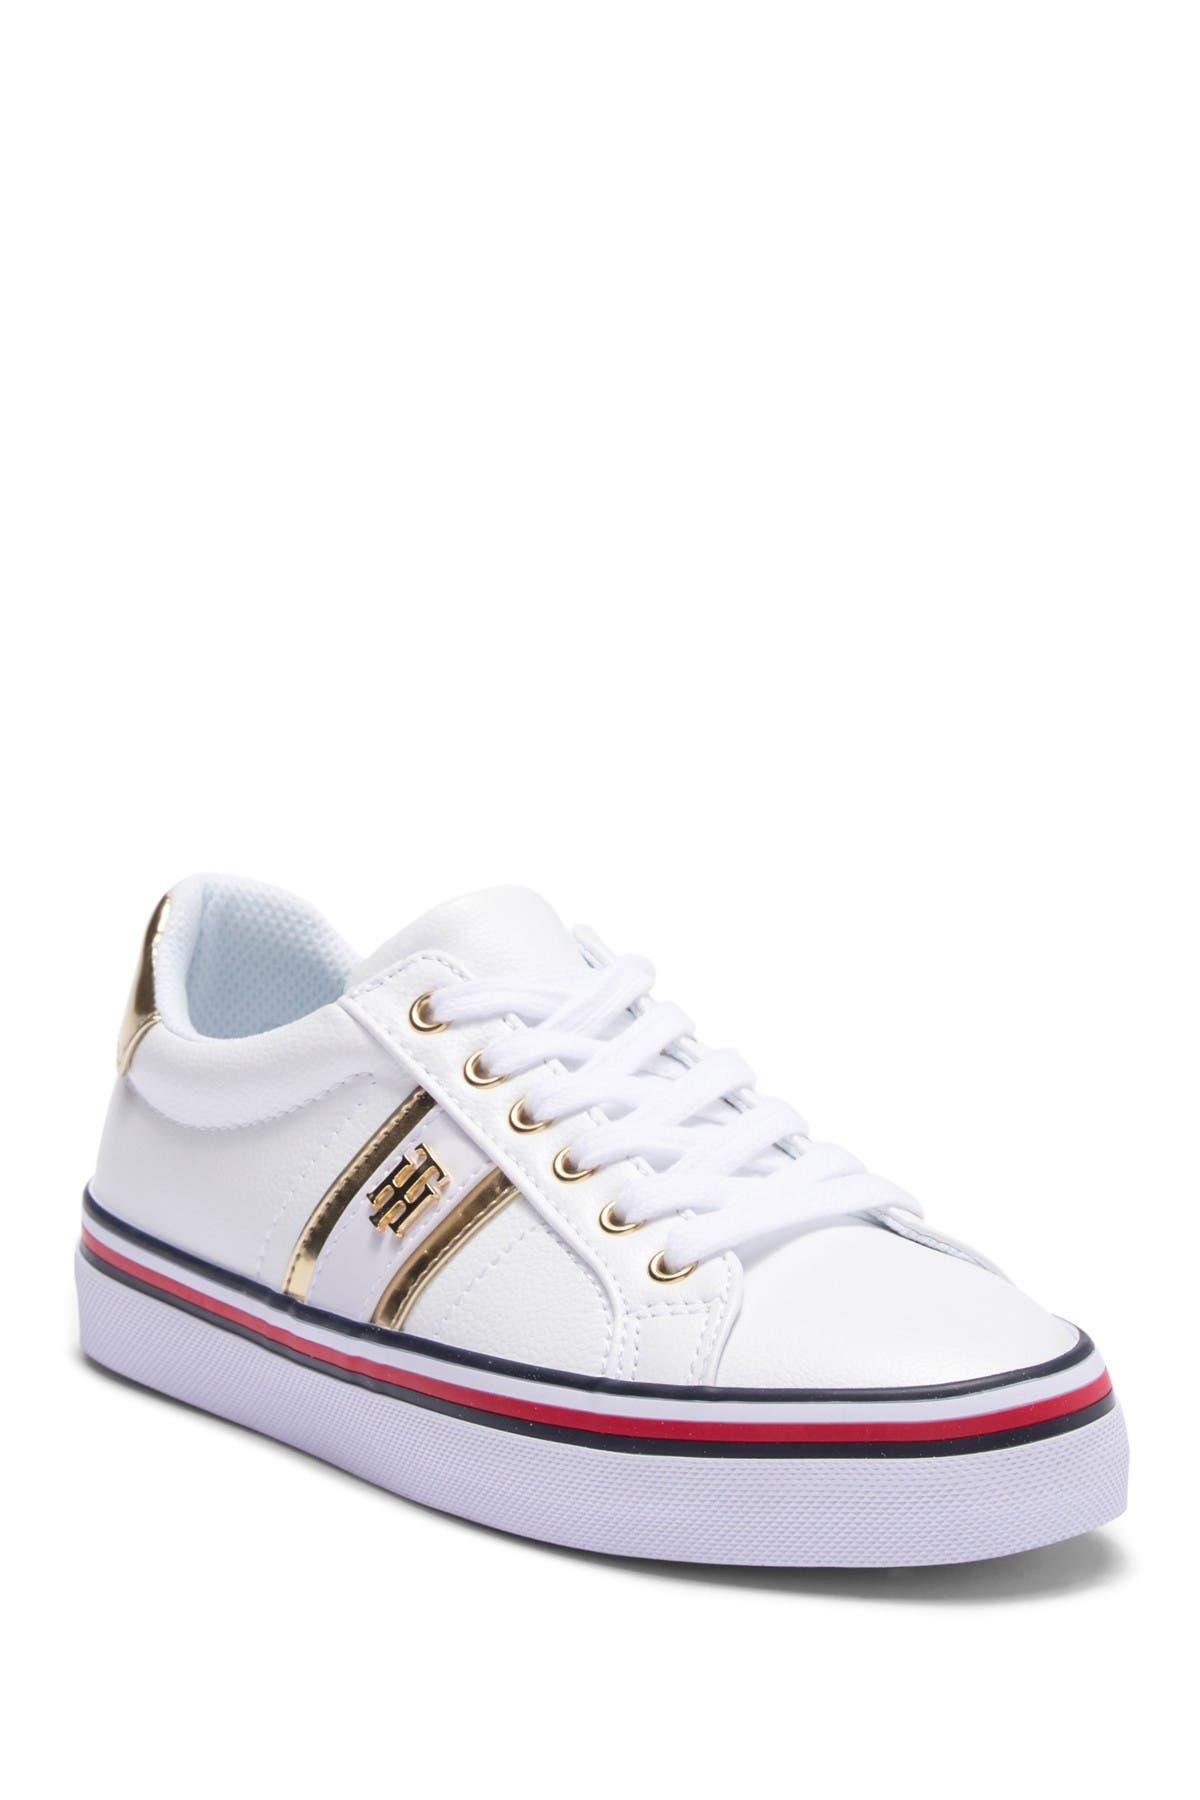 Tommy Hilfiger | Fentii Sneaker